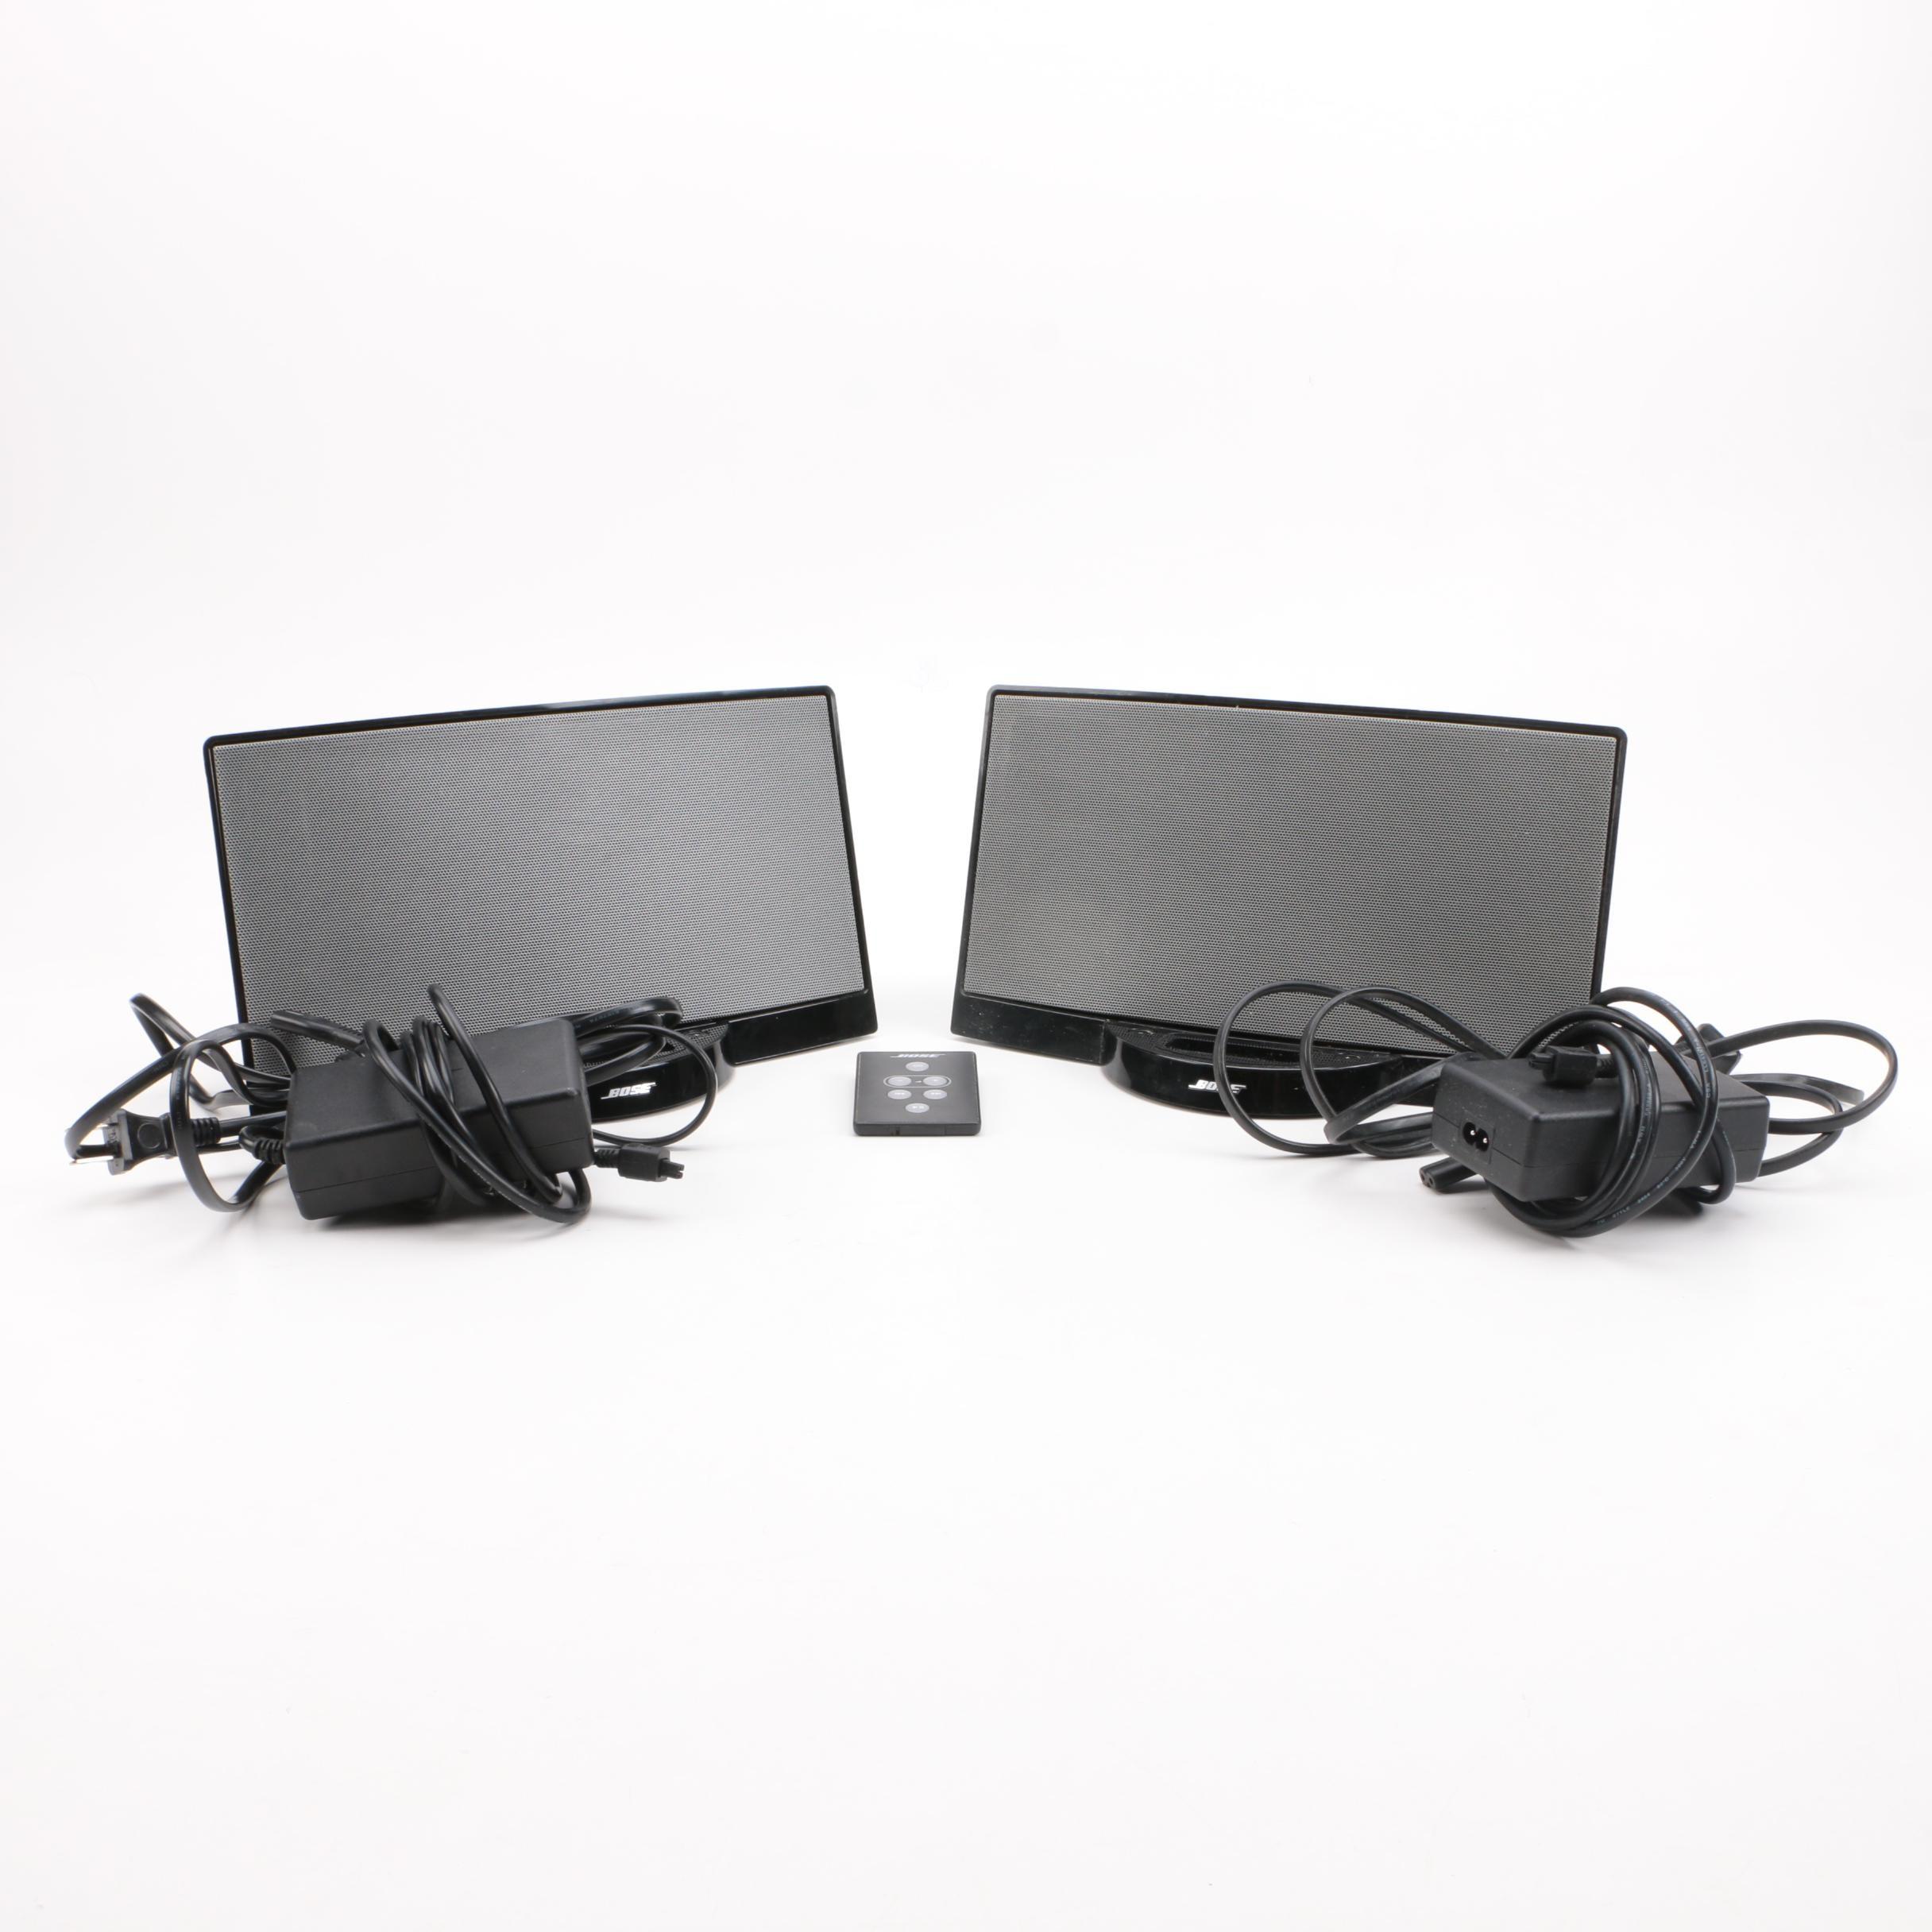 Bose Speakers for Digital Media Players